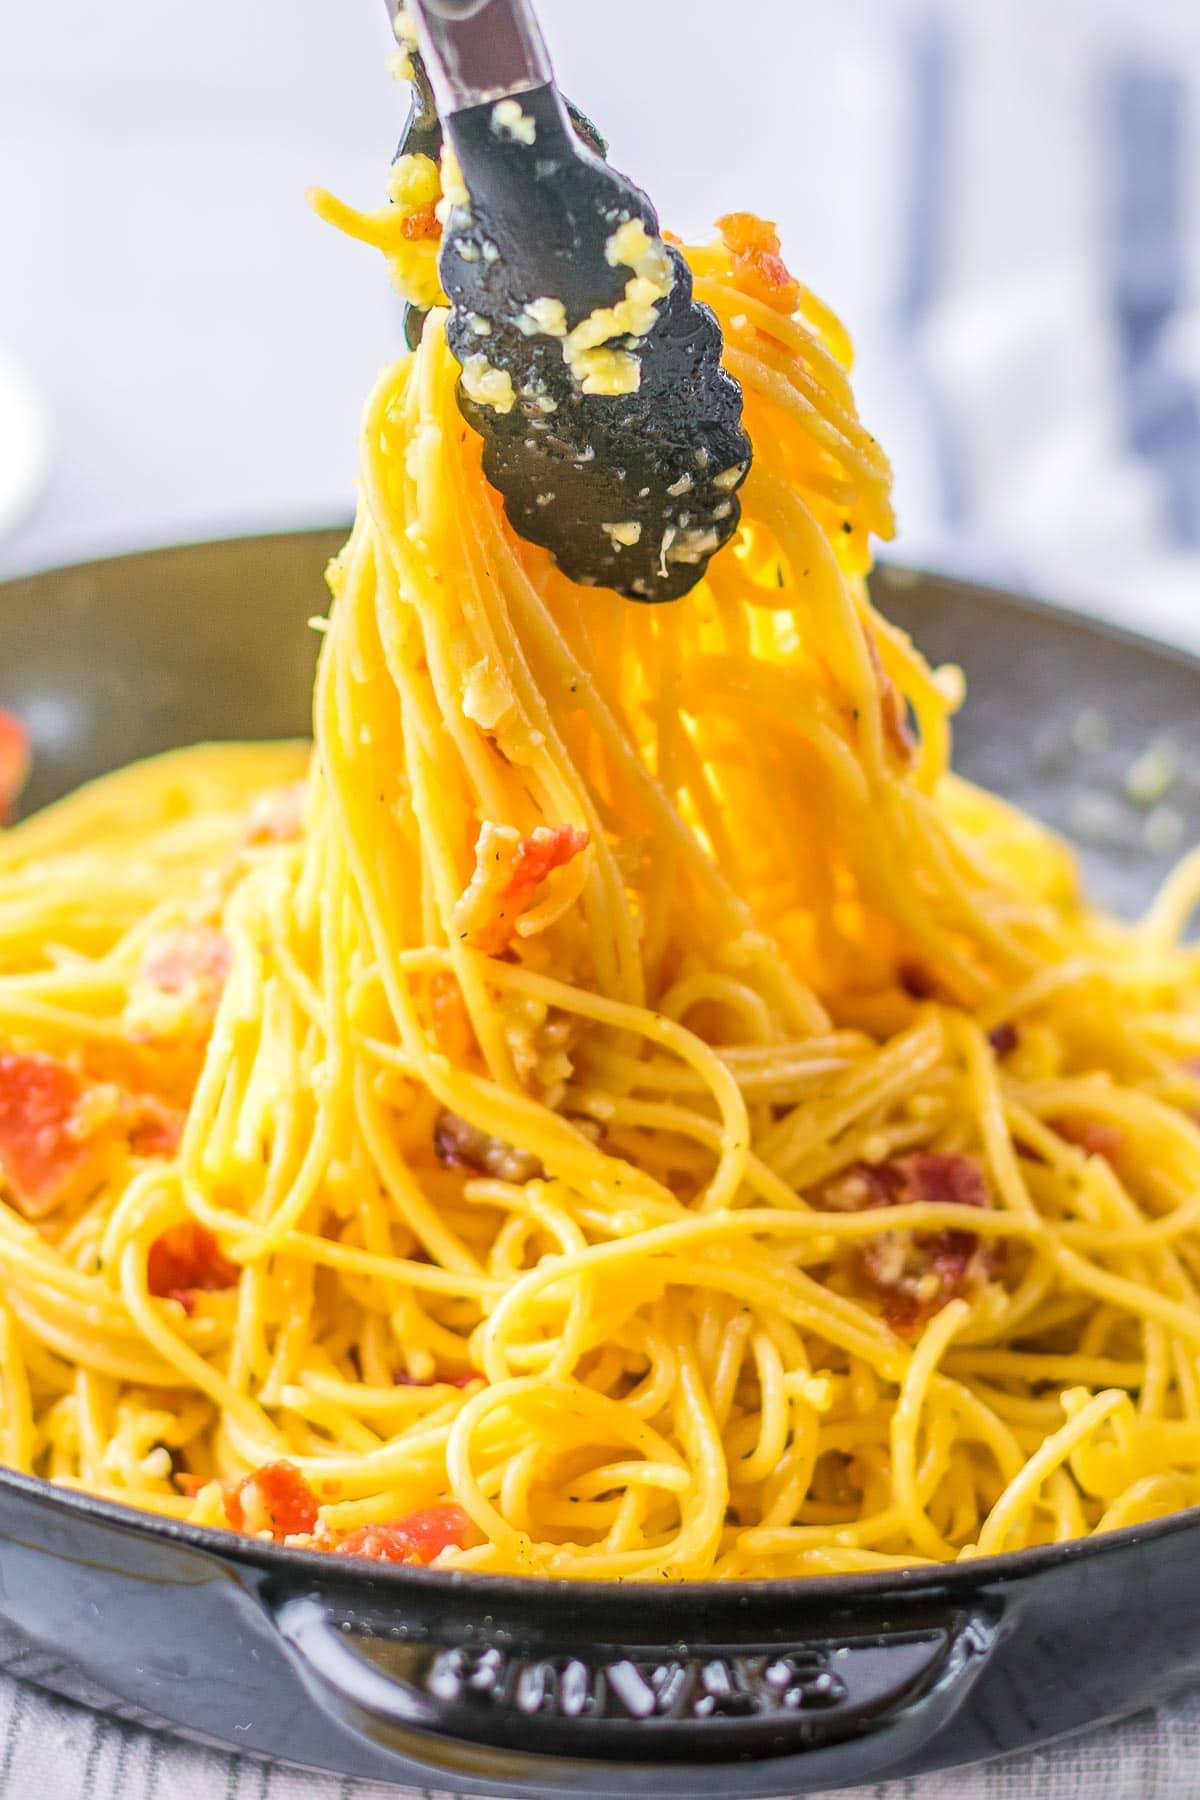 spaghetti carbonara with tongs